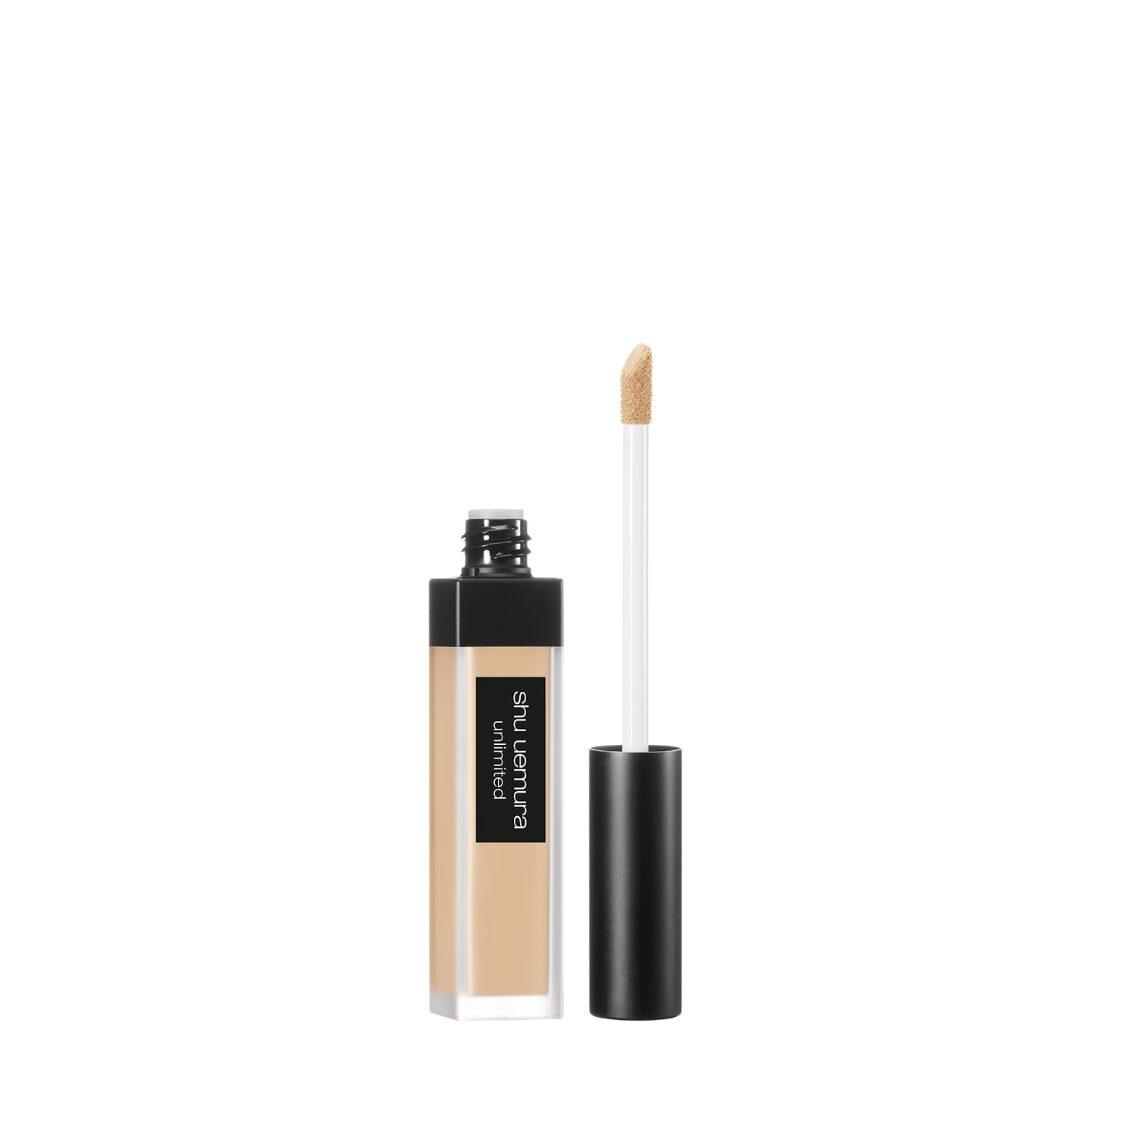 Shu Uemura Unlimited Breathable Lasting Concealer